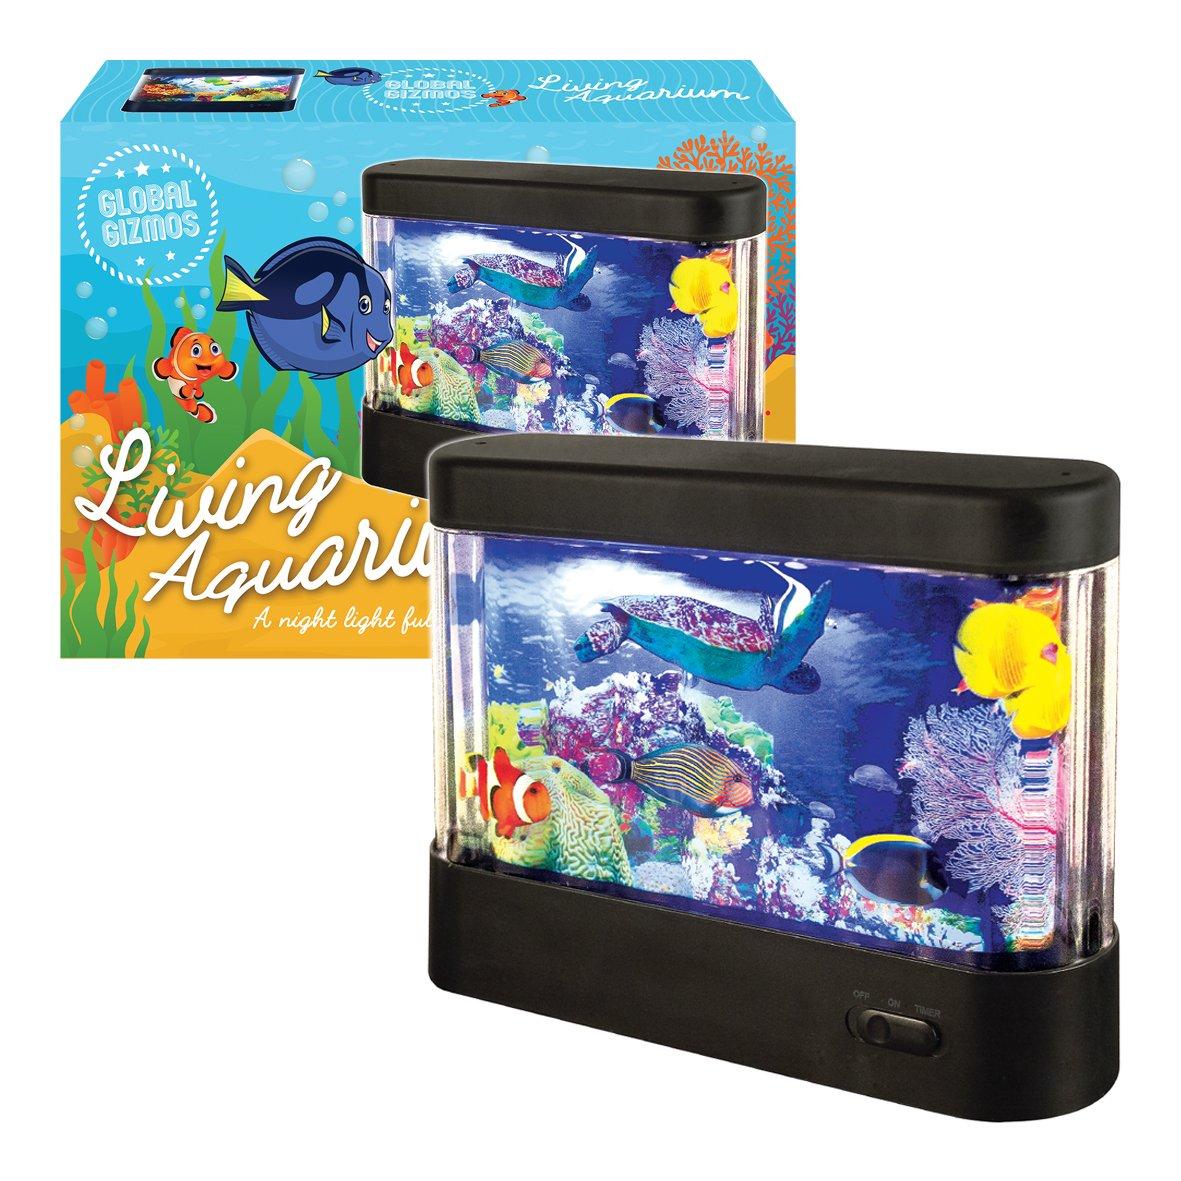 Artificial aquarium fish tank - Global Gizmos Led Battery Operated Small Living Aquarium Plastic Black